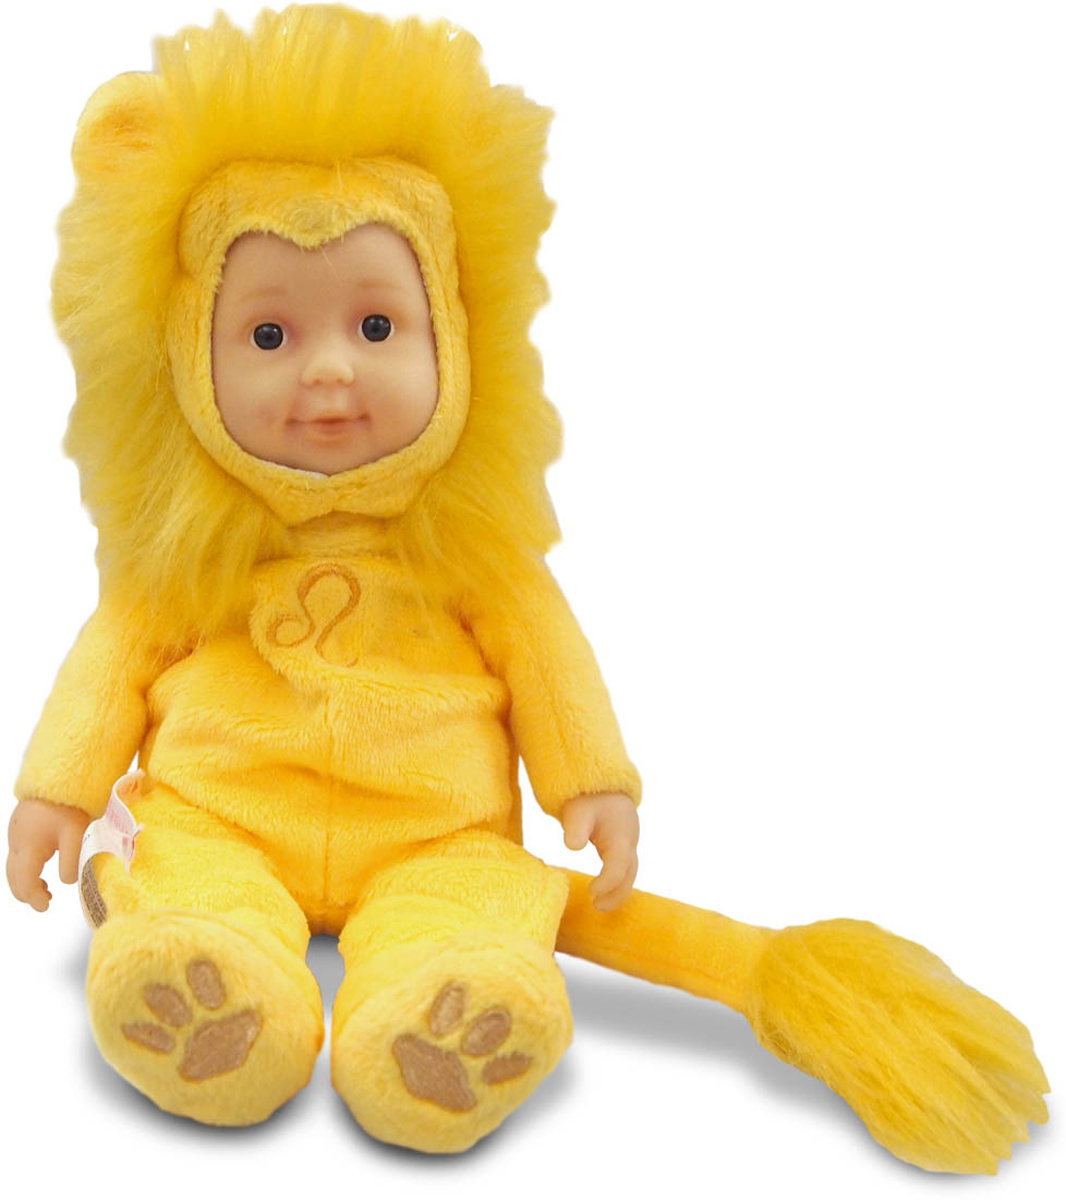 Ovation Anne Geddes Кукла Знаки зодиака Лев